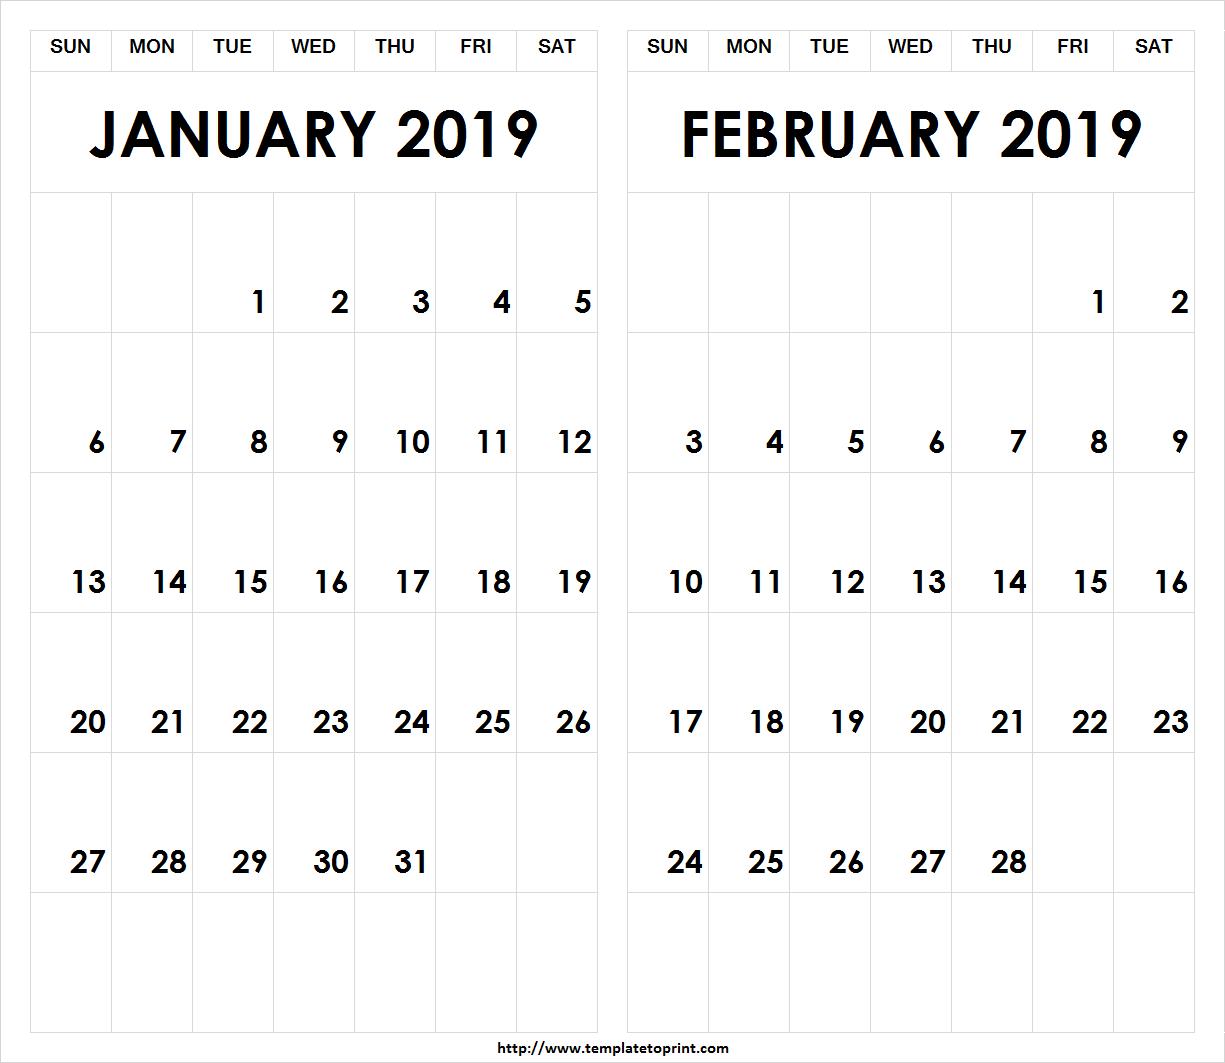 Printable 2019 January February Calendar » Template To Print Calendar 2019 January And February